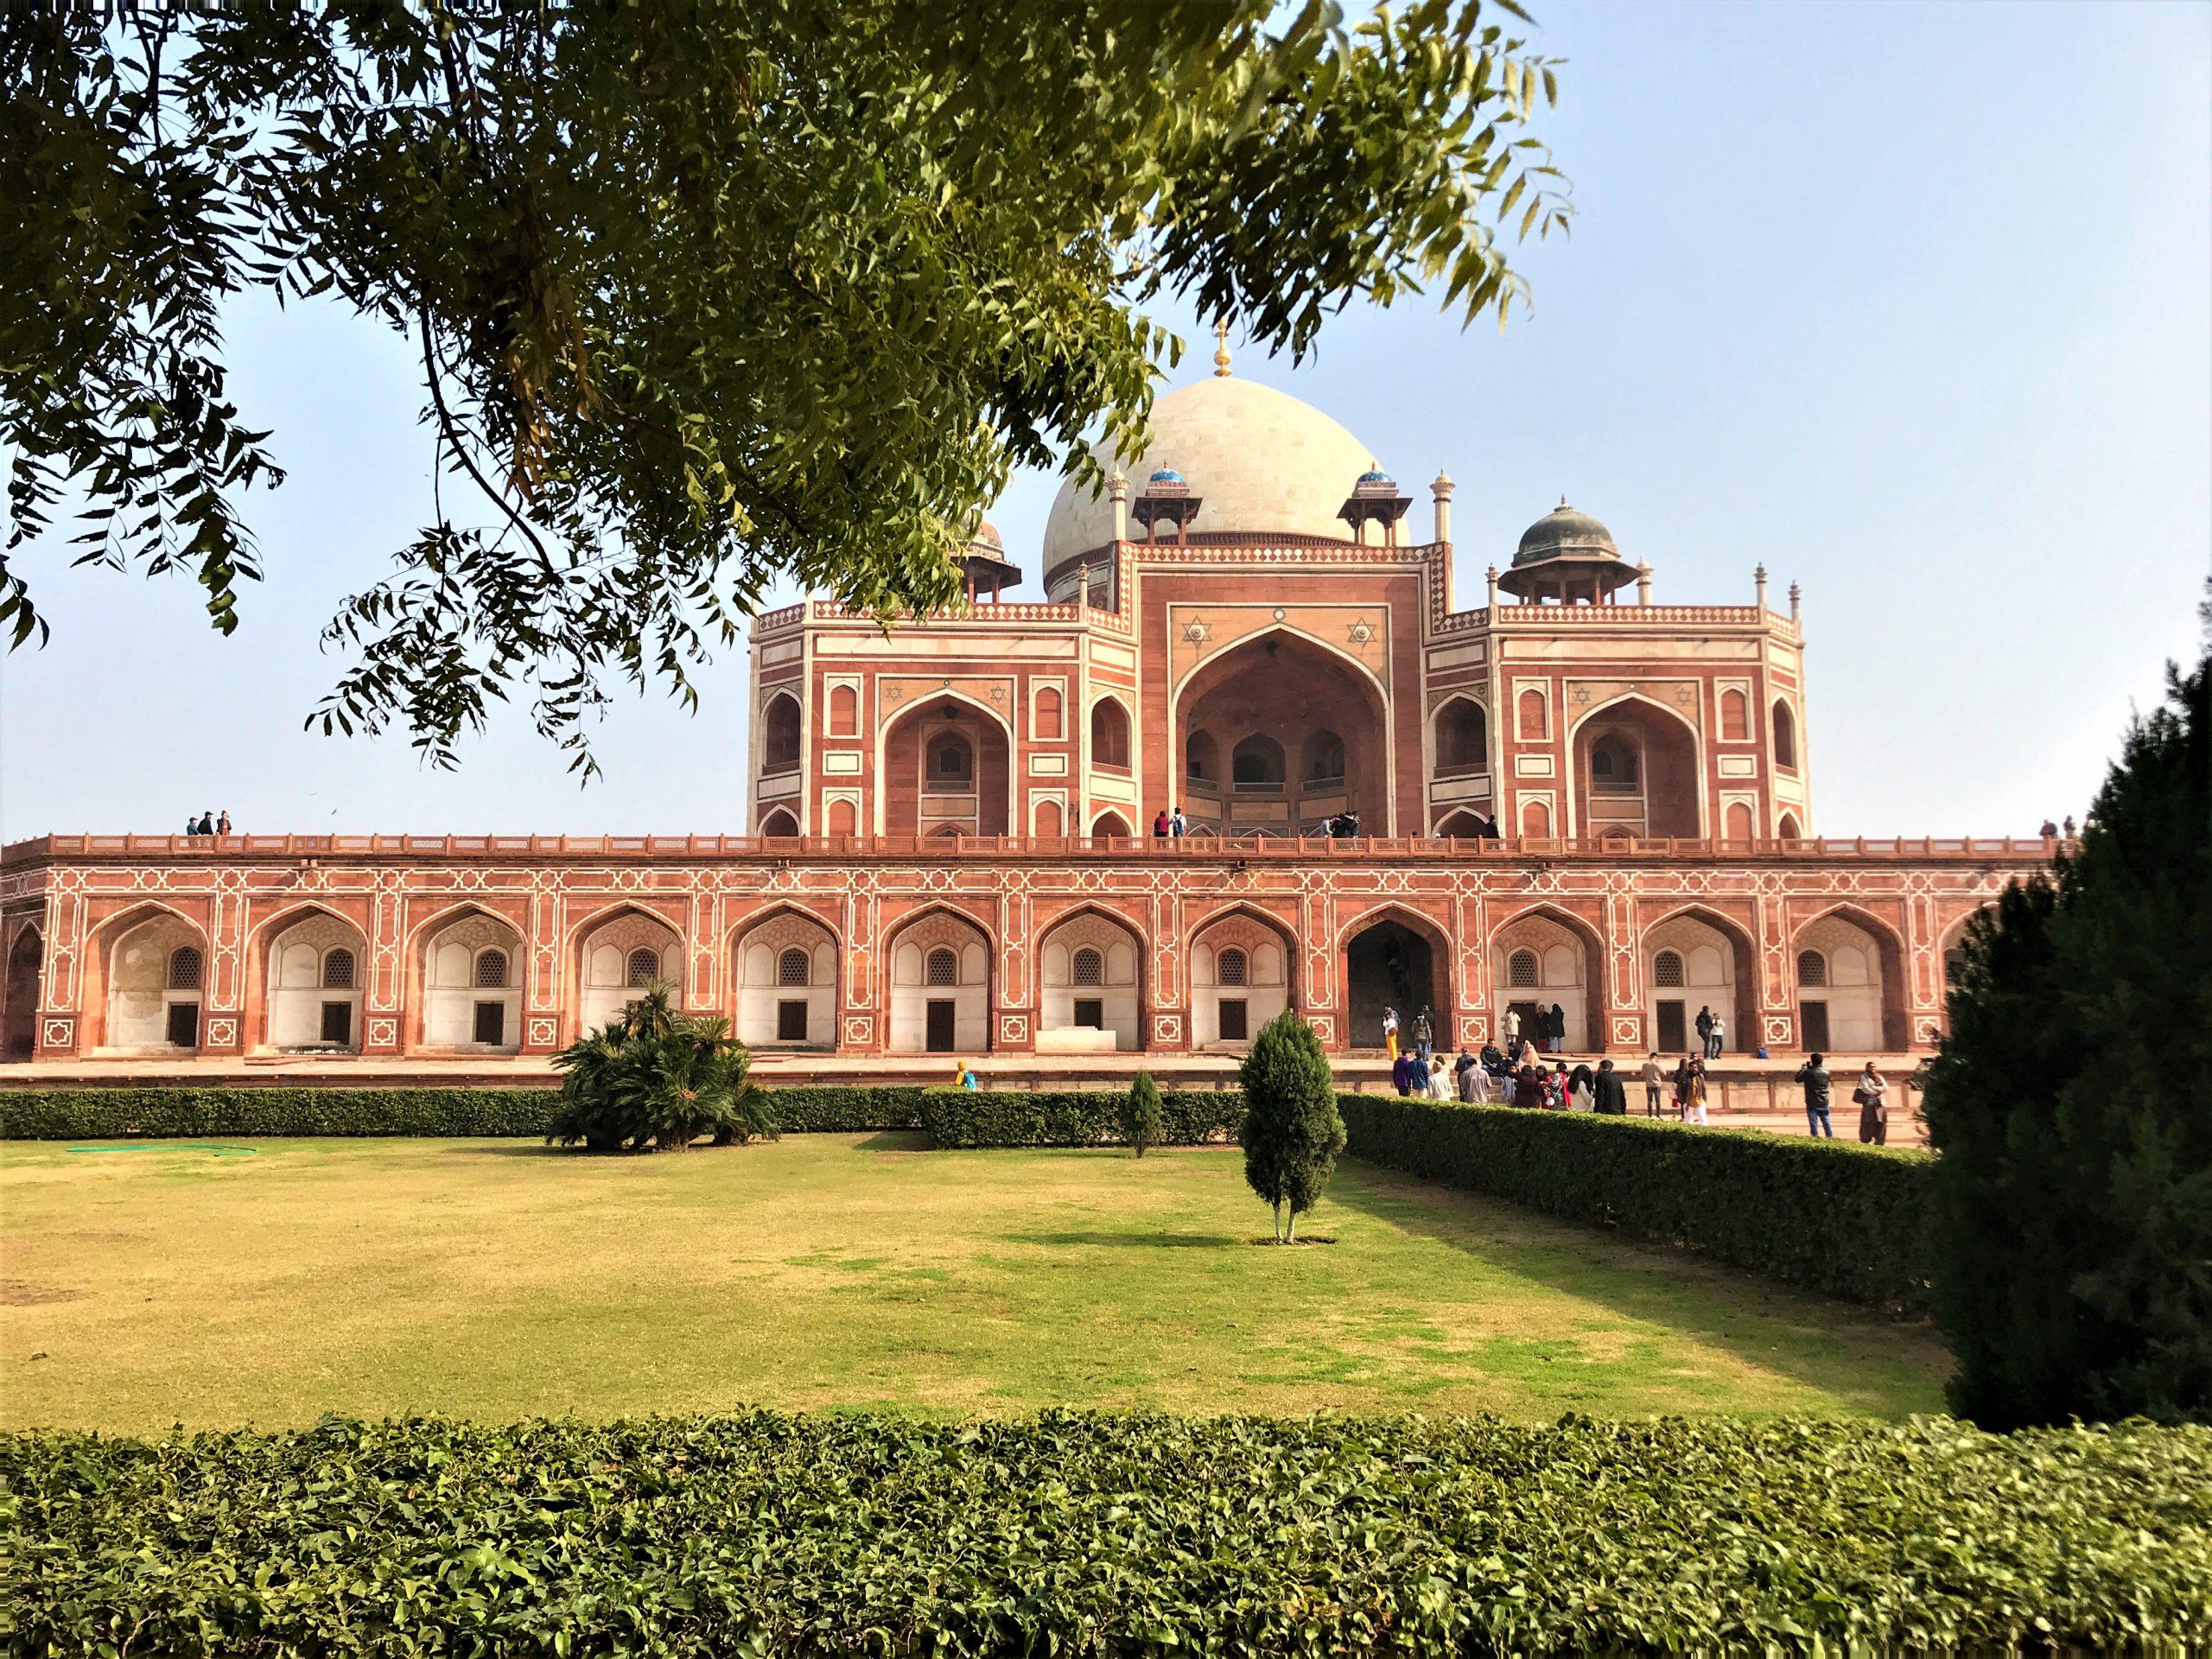 Humayun's Tomb in Delhi, India believed to be the predecessor of the Taj Mahal in Agra